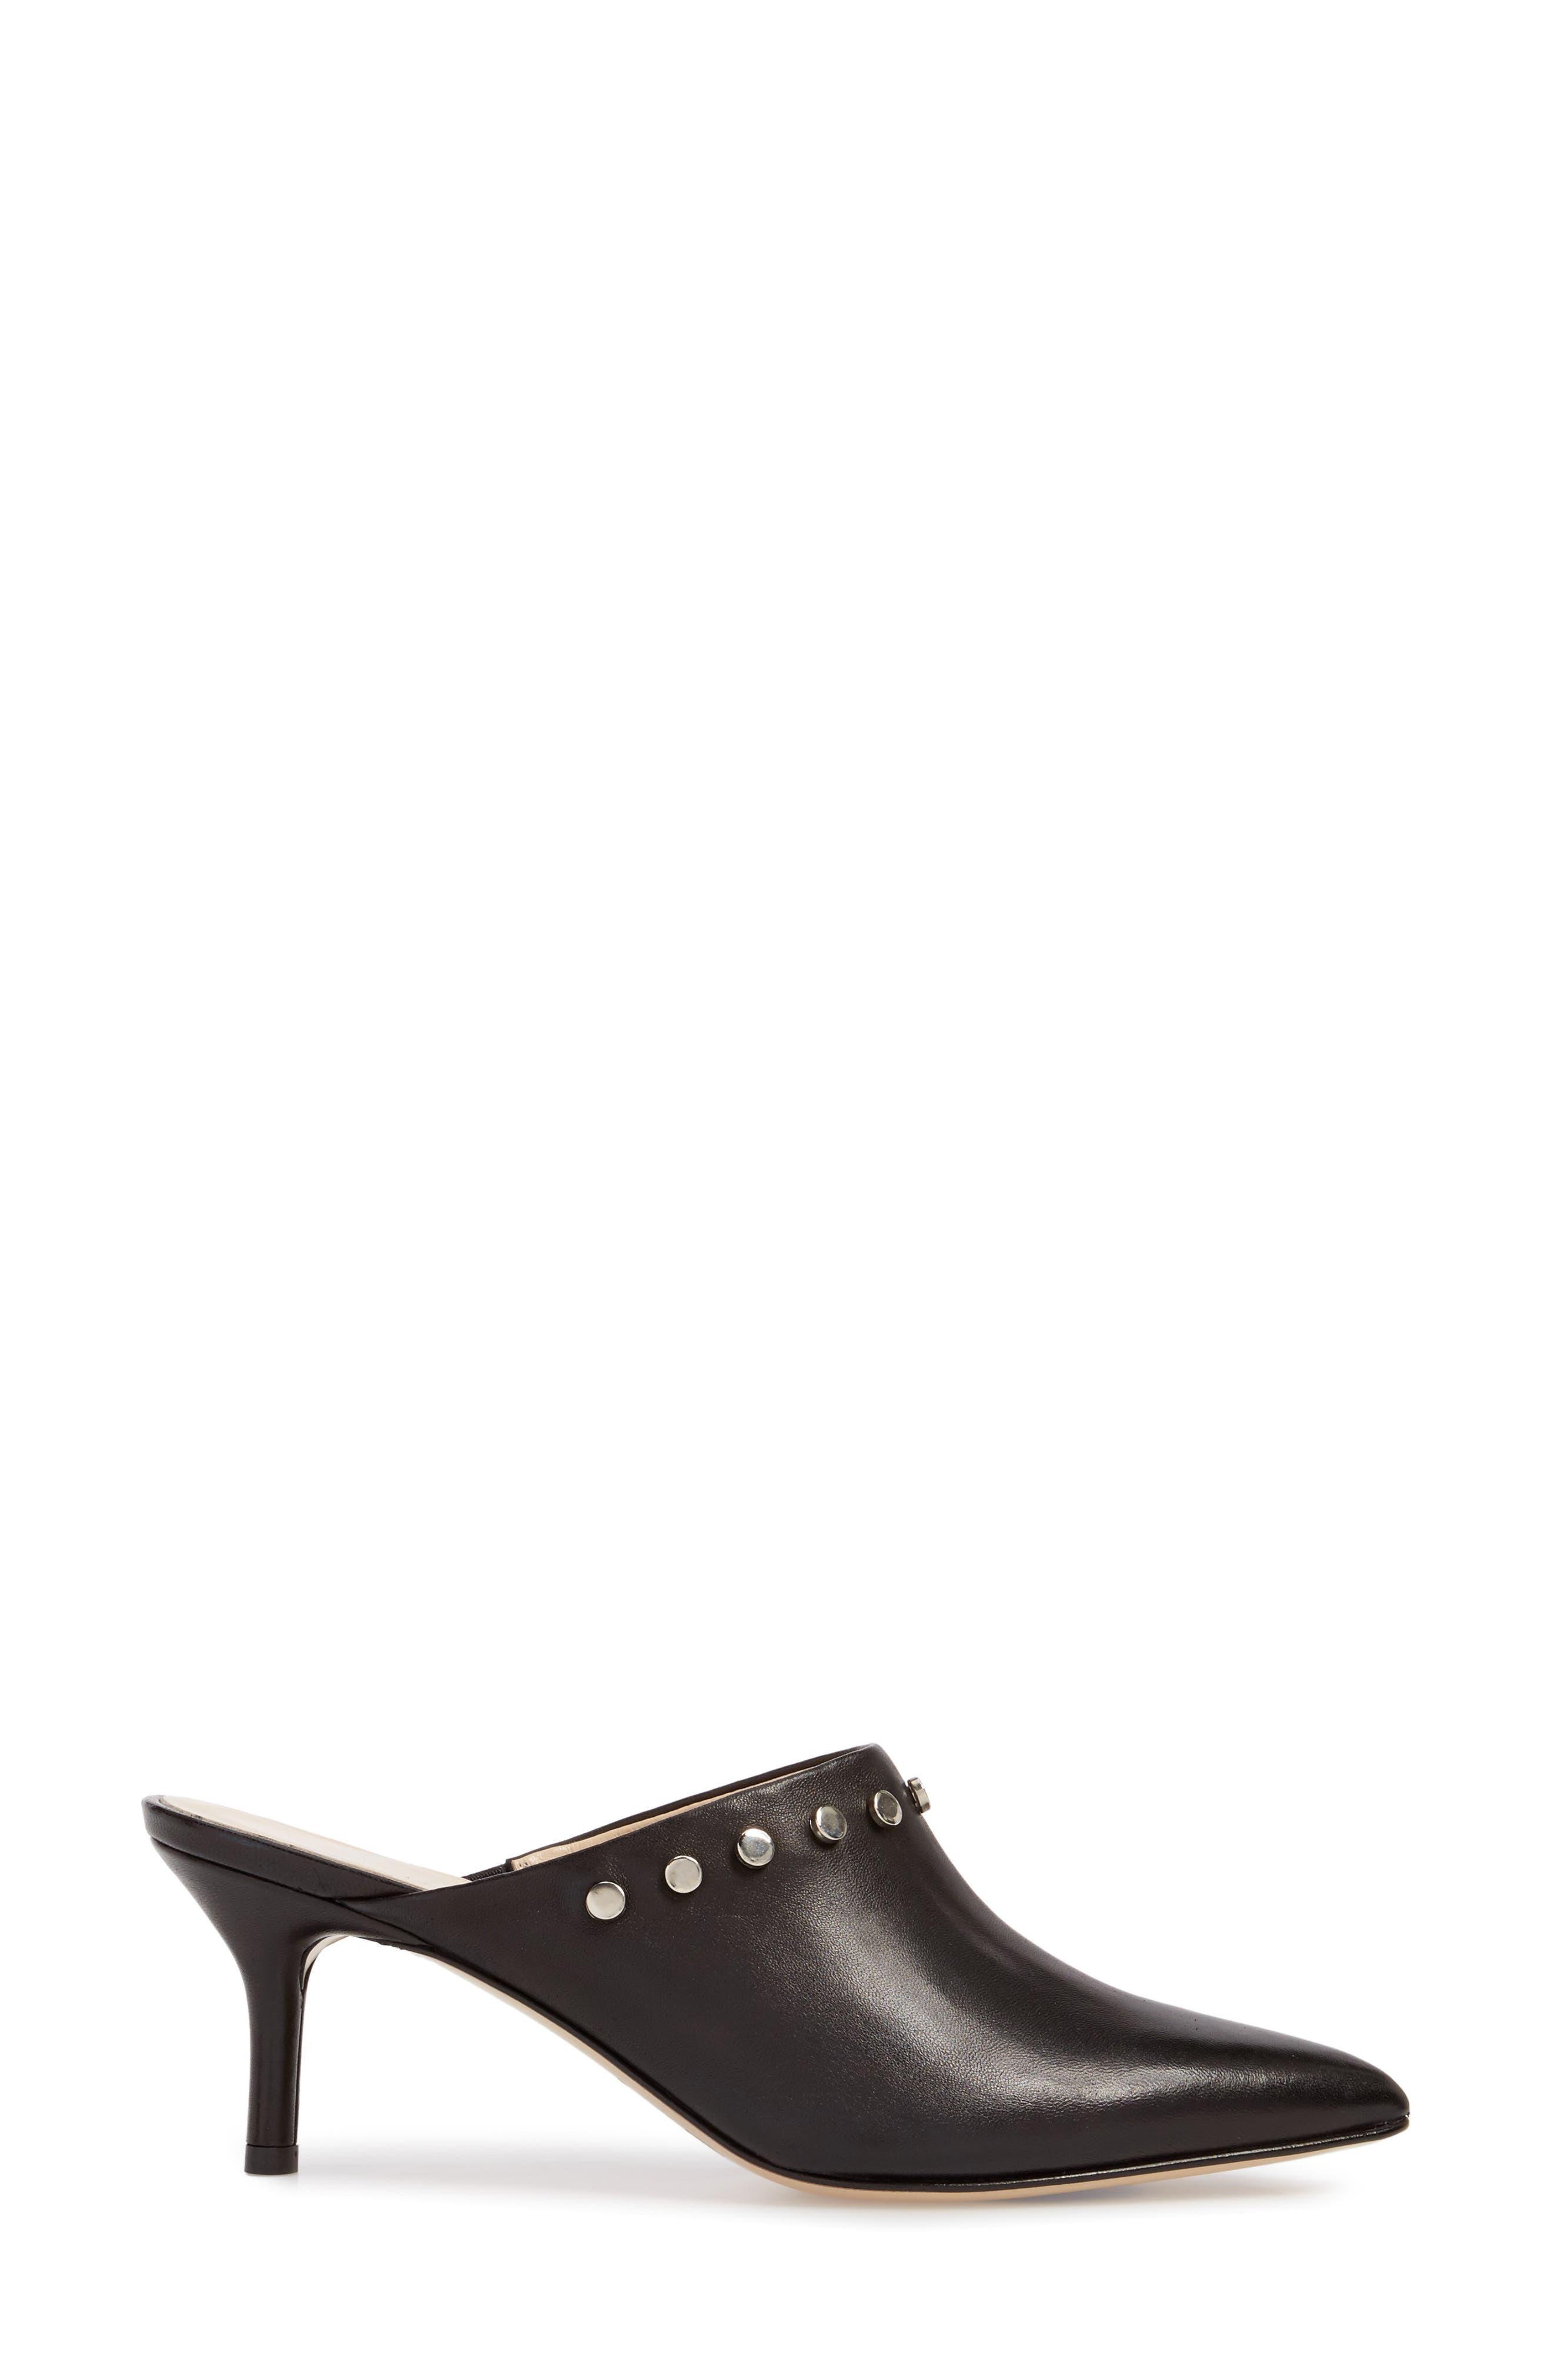 Priamo Mule,                             Alternate thumbnail 3, color,                             Black Leather